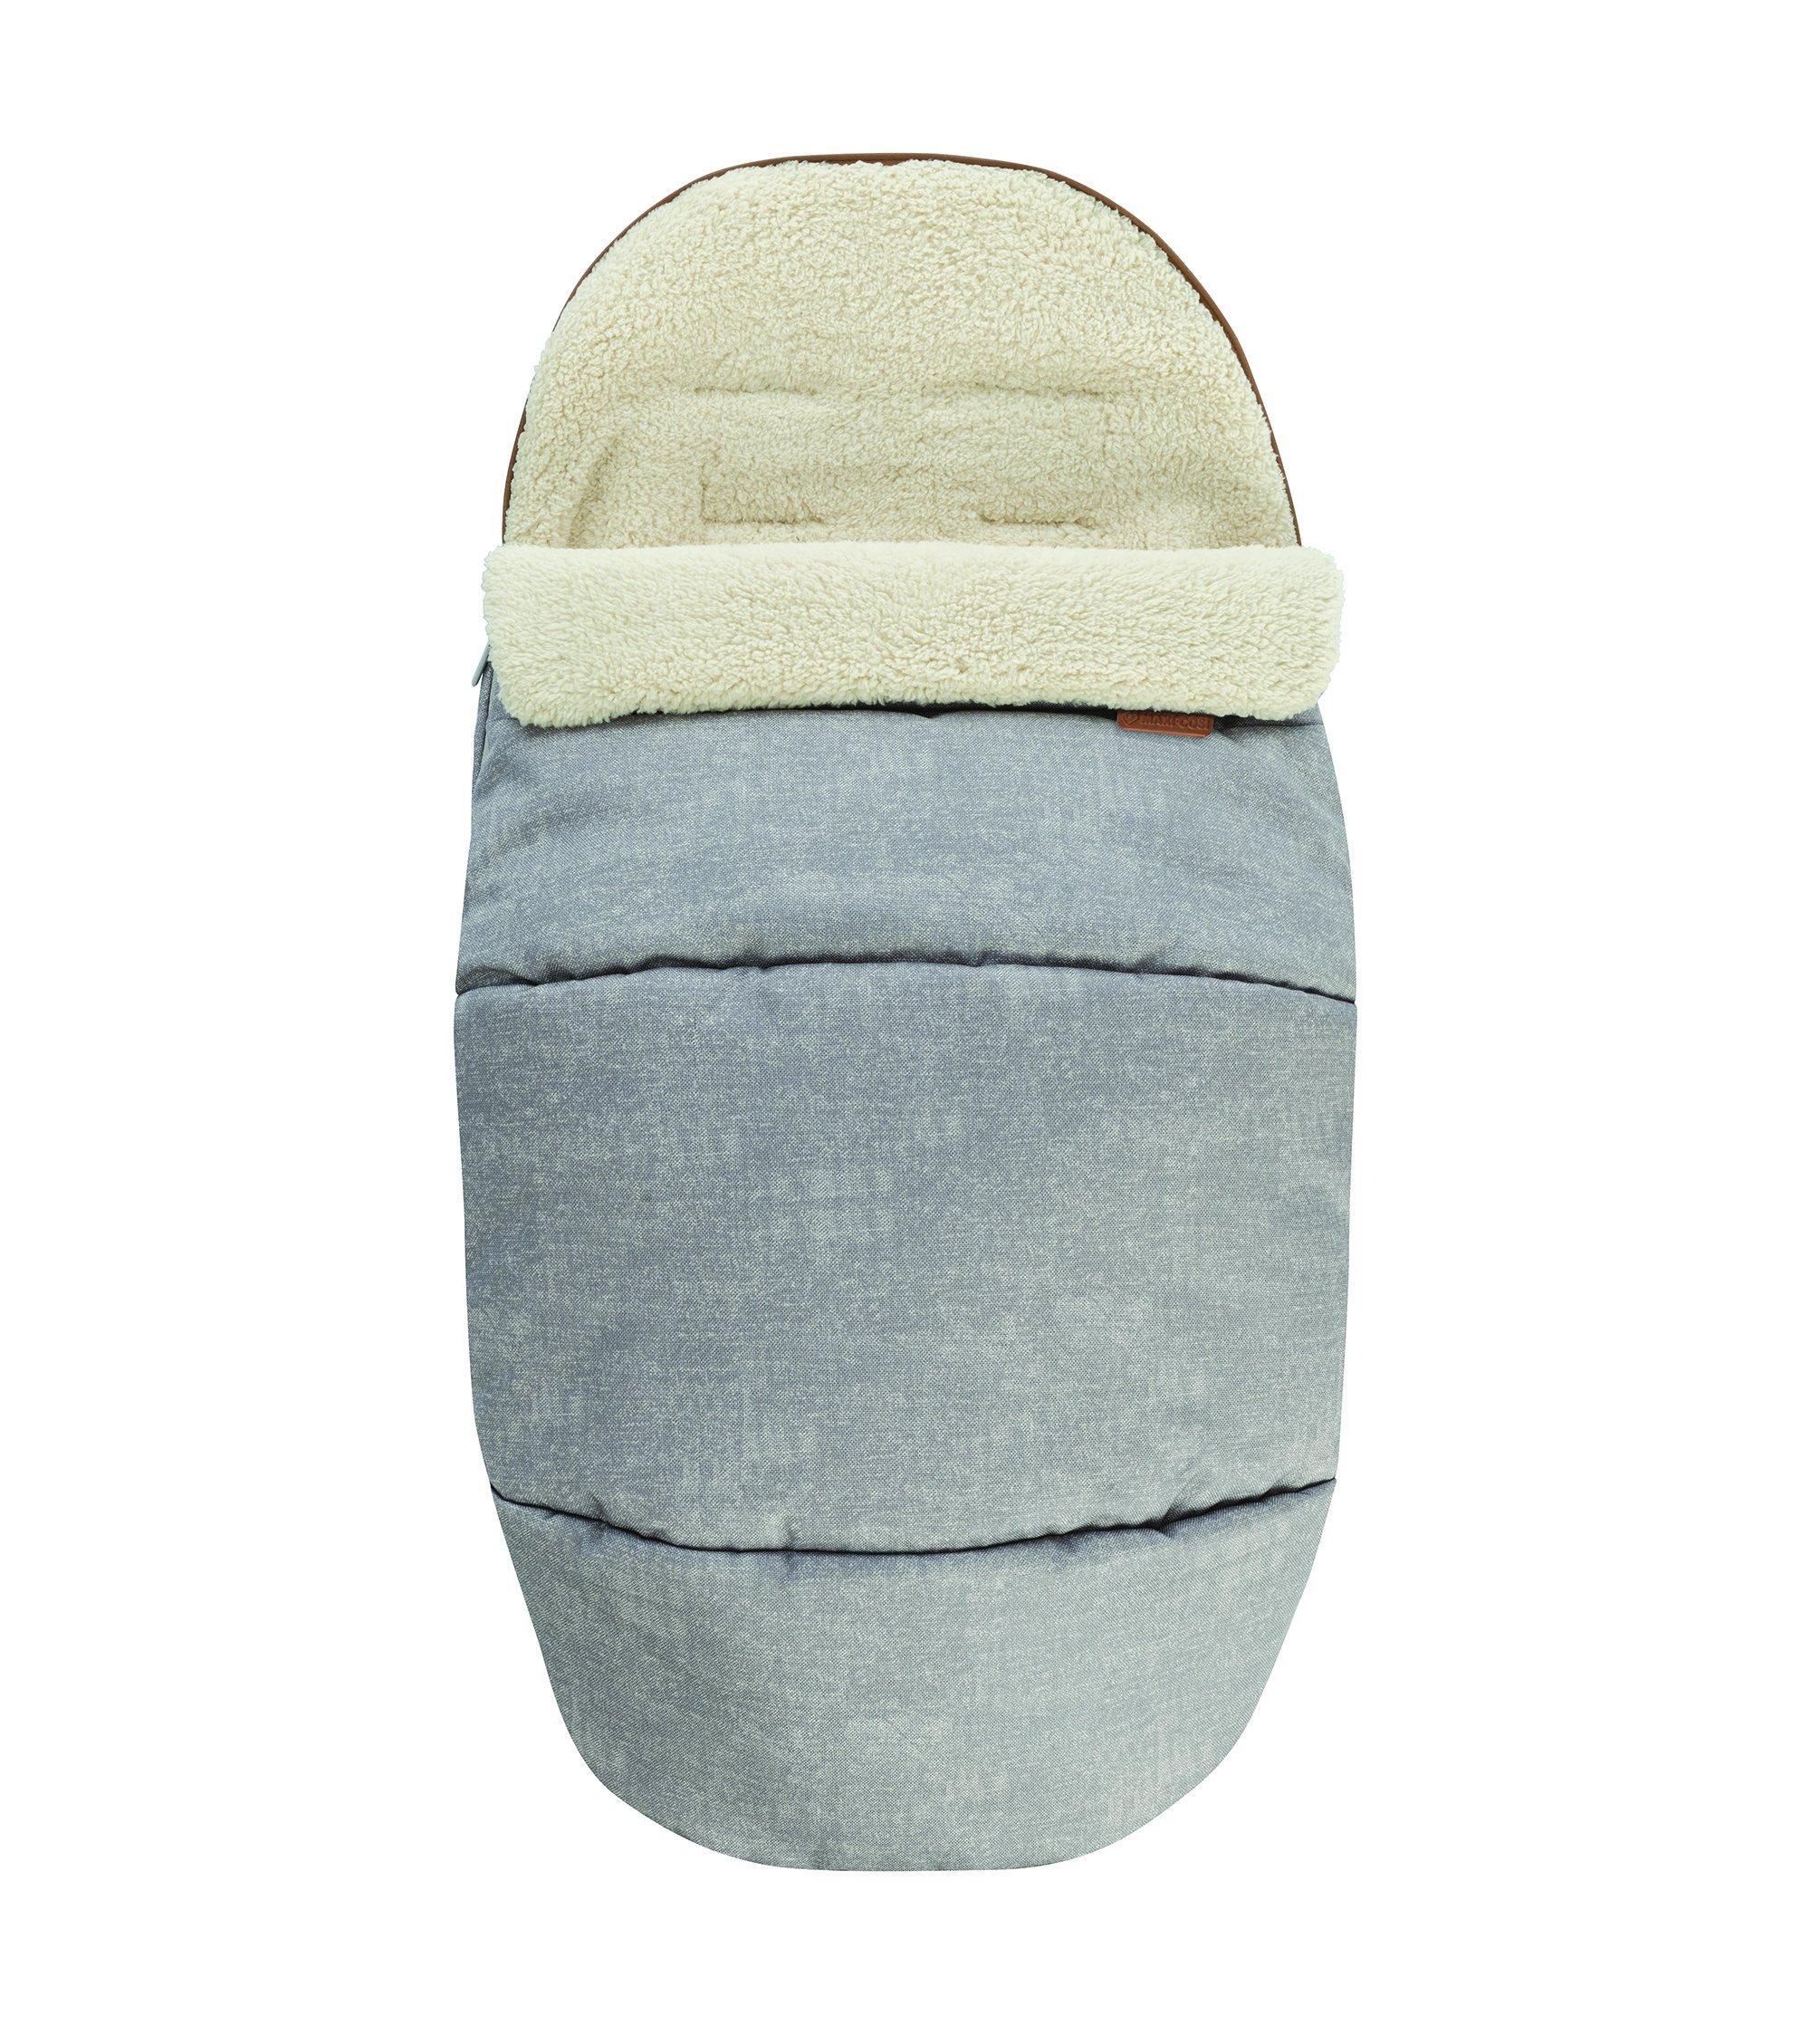 Maxi-COSI 2-in-1 Footmuff, Nomad Grey